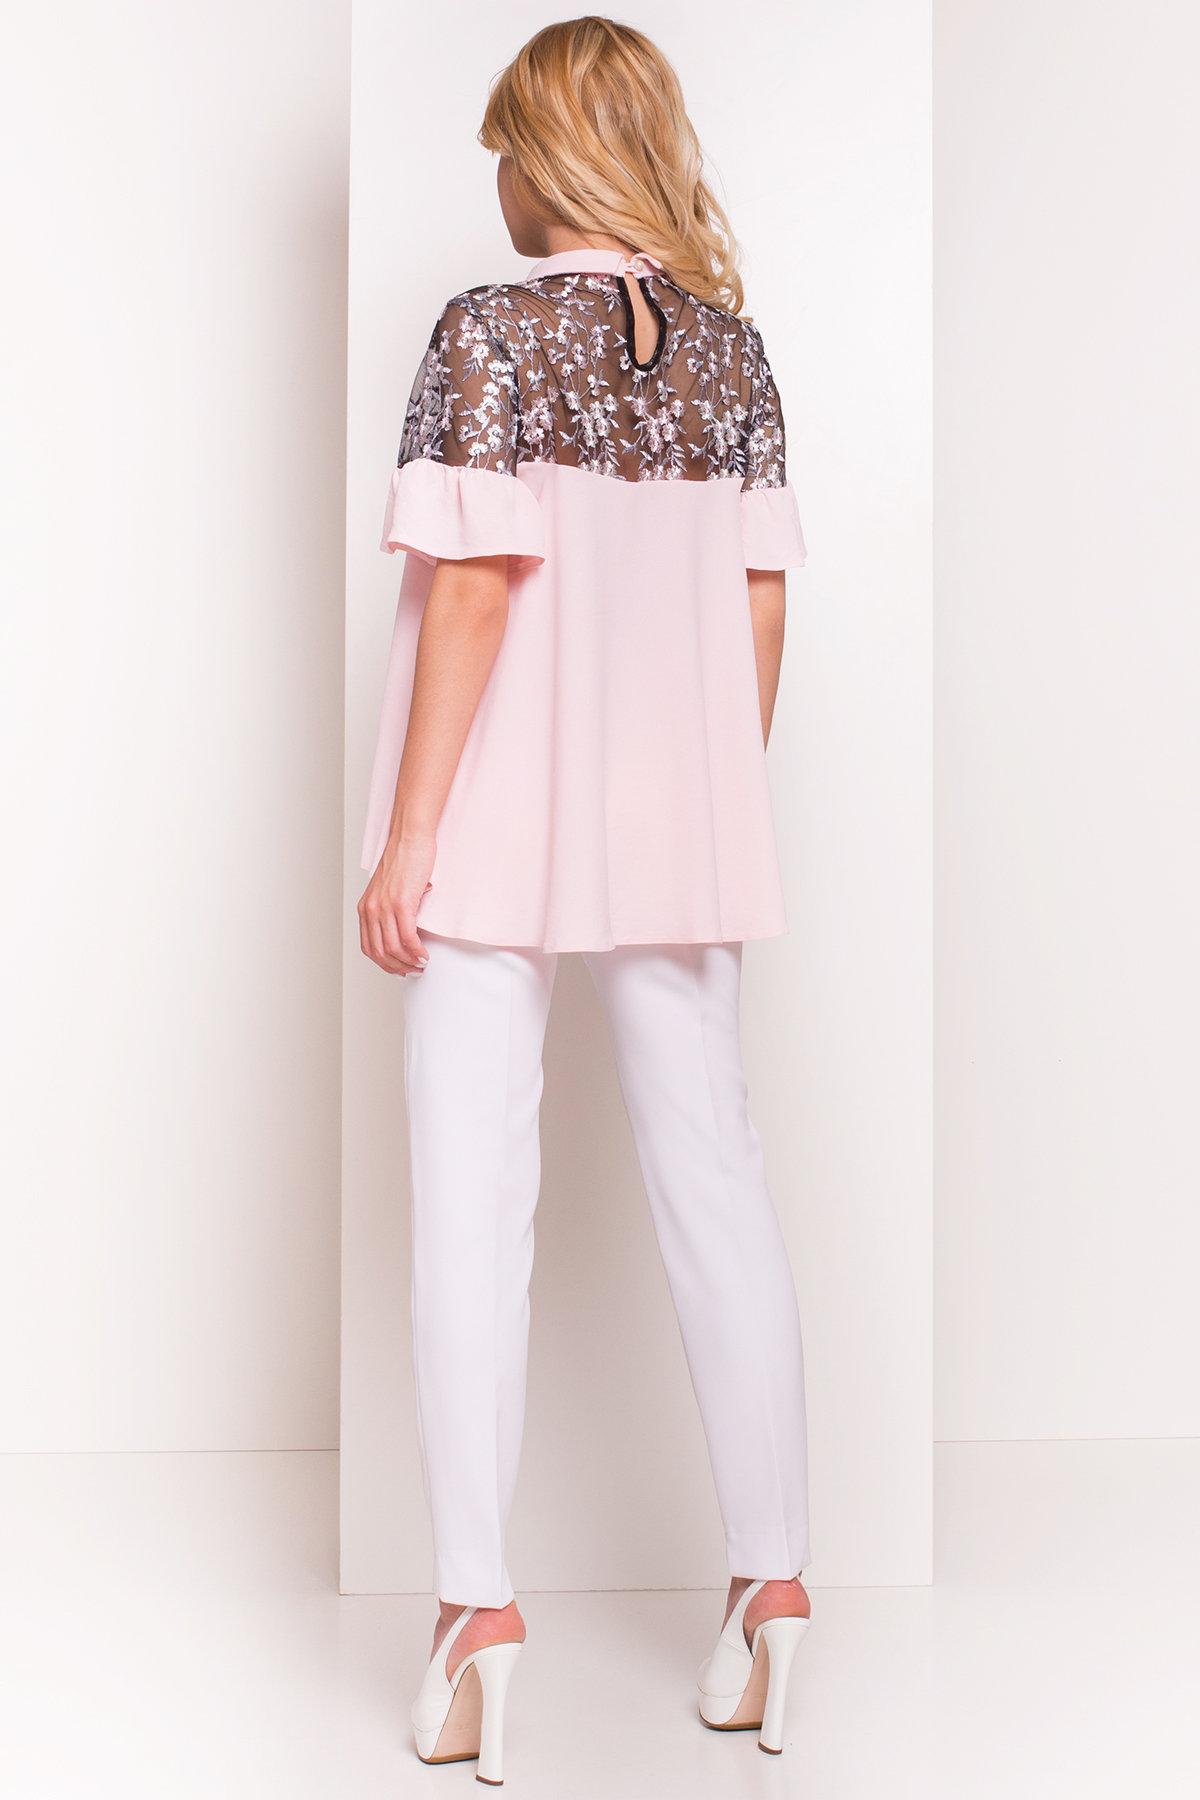 Блуза Анафи 5105 Цвет: Розовый Светлый